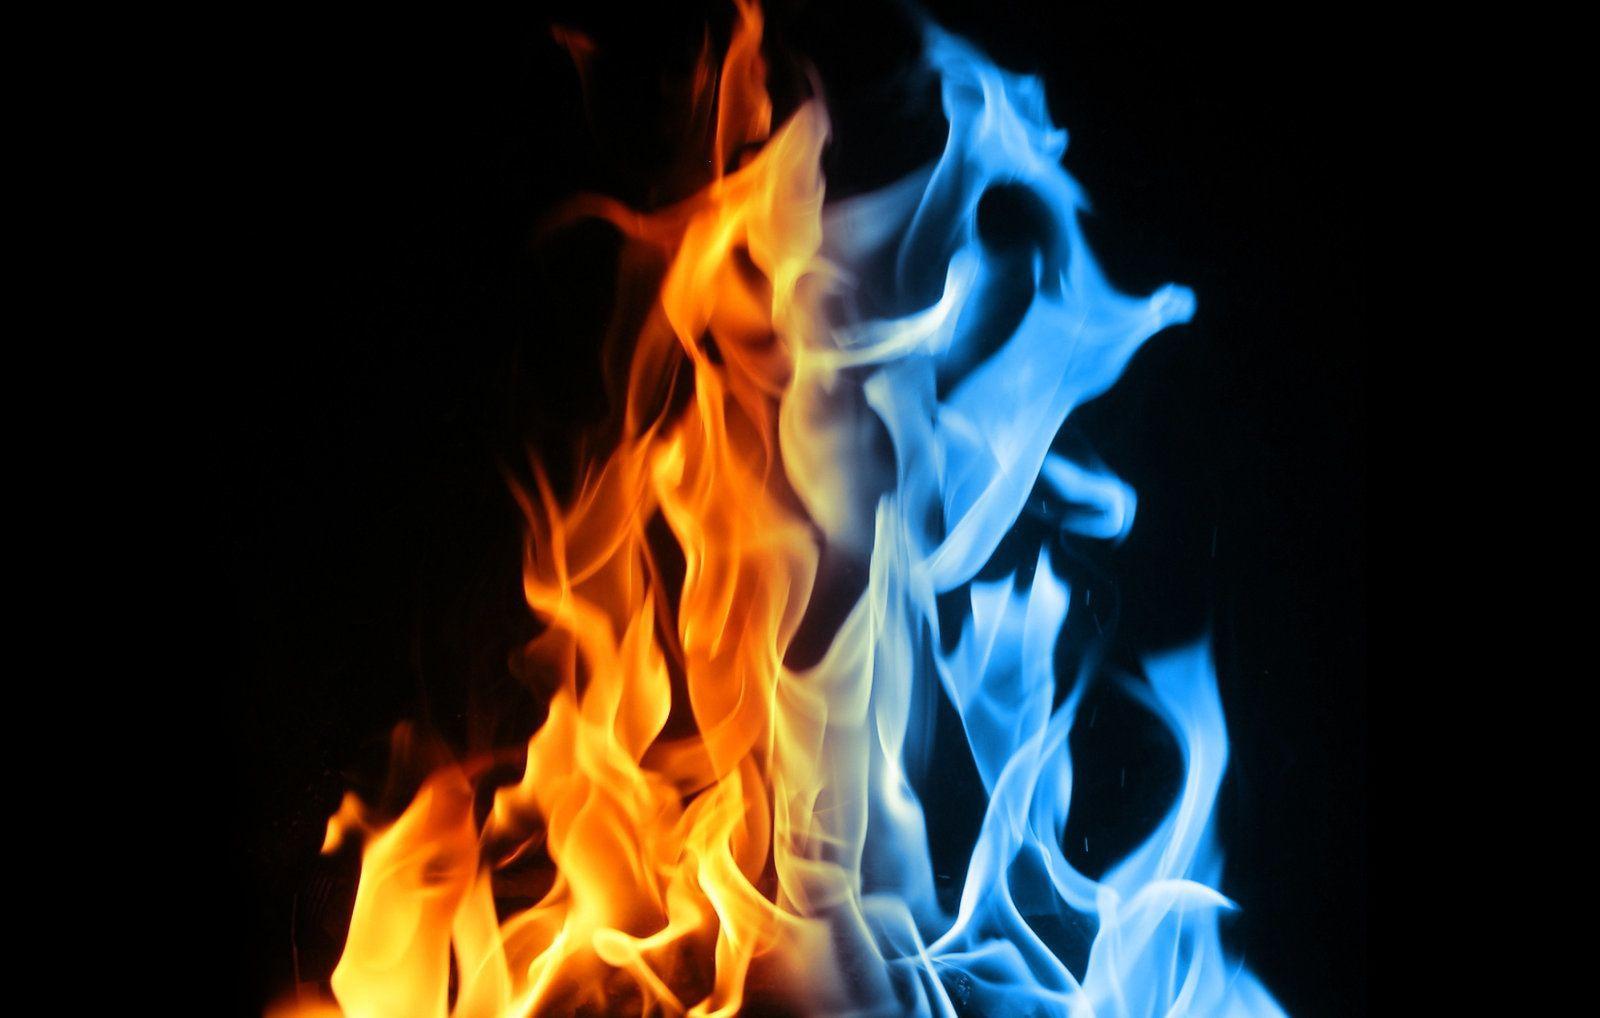 Fire Flames Hd Wallpaper